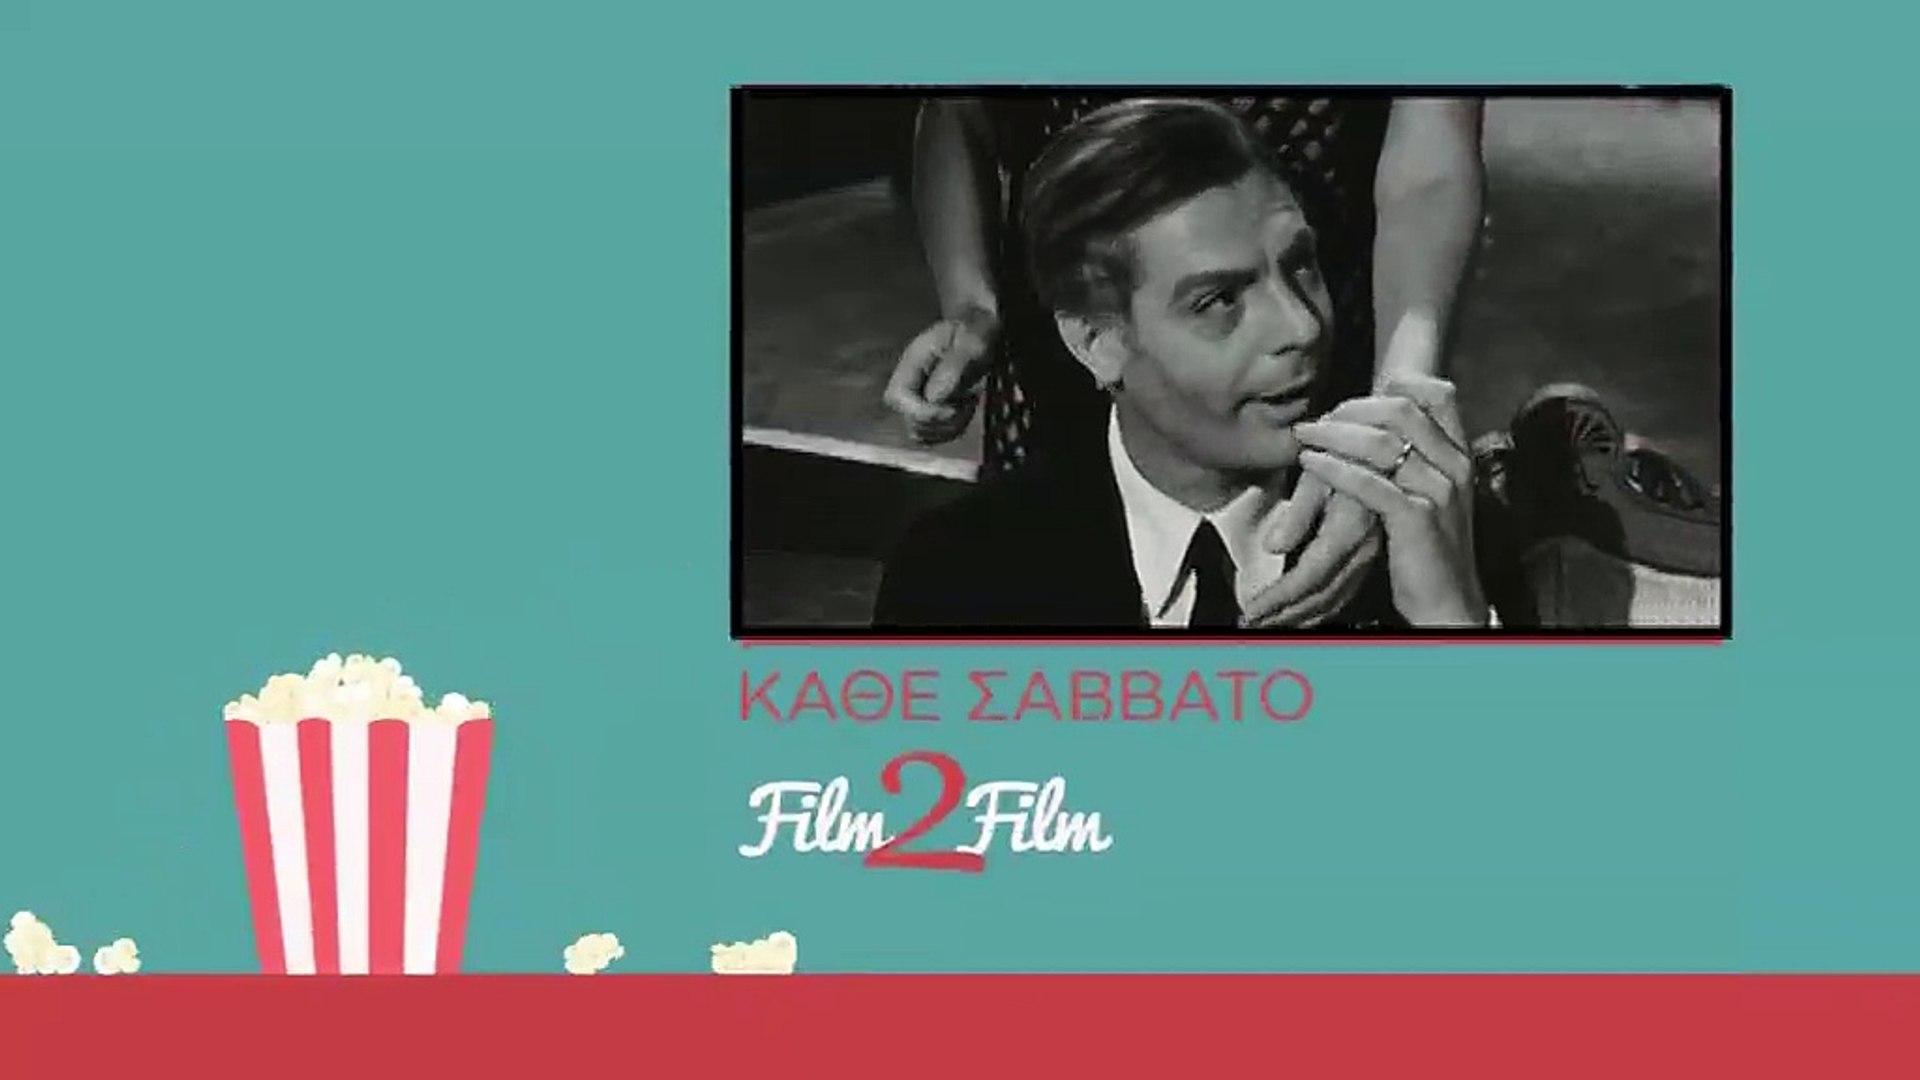 Trailer cinema film 2 film